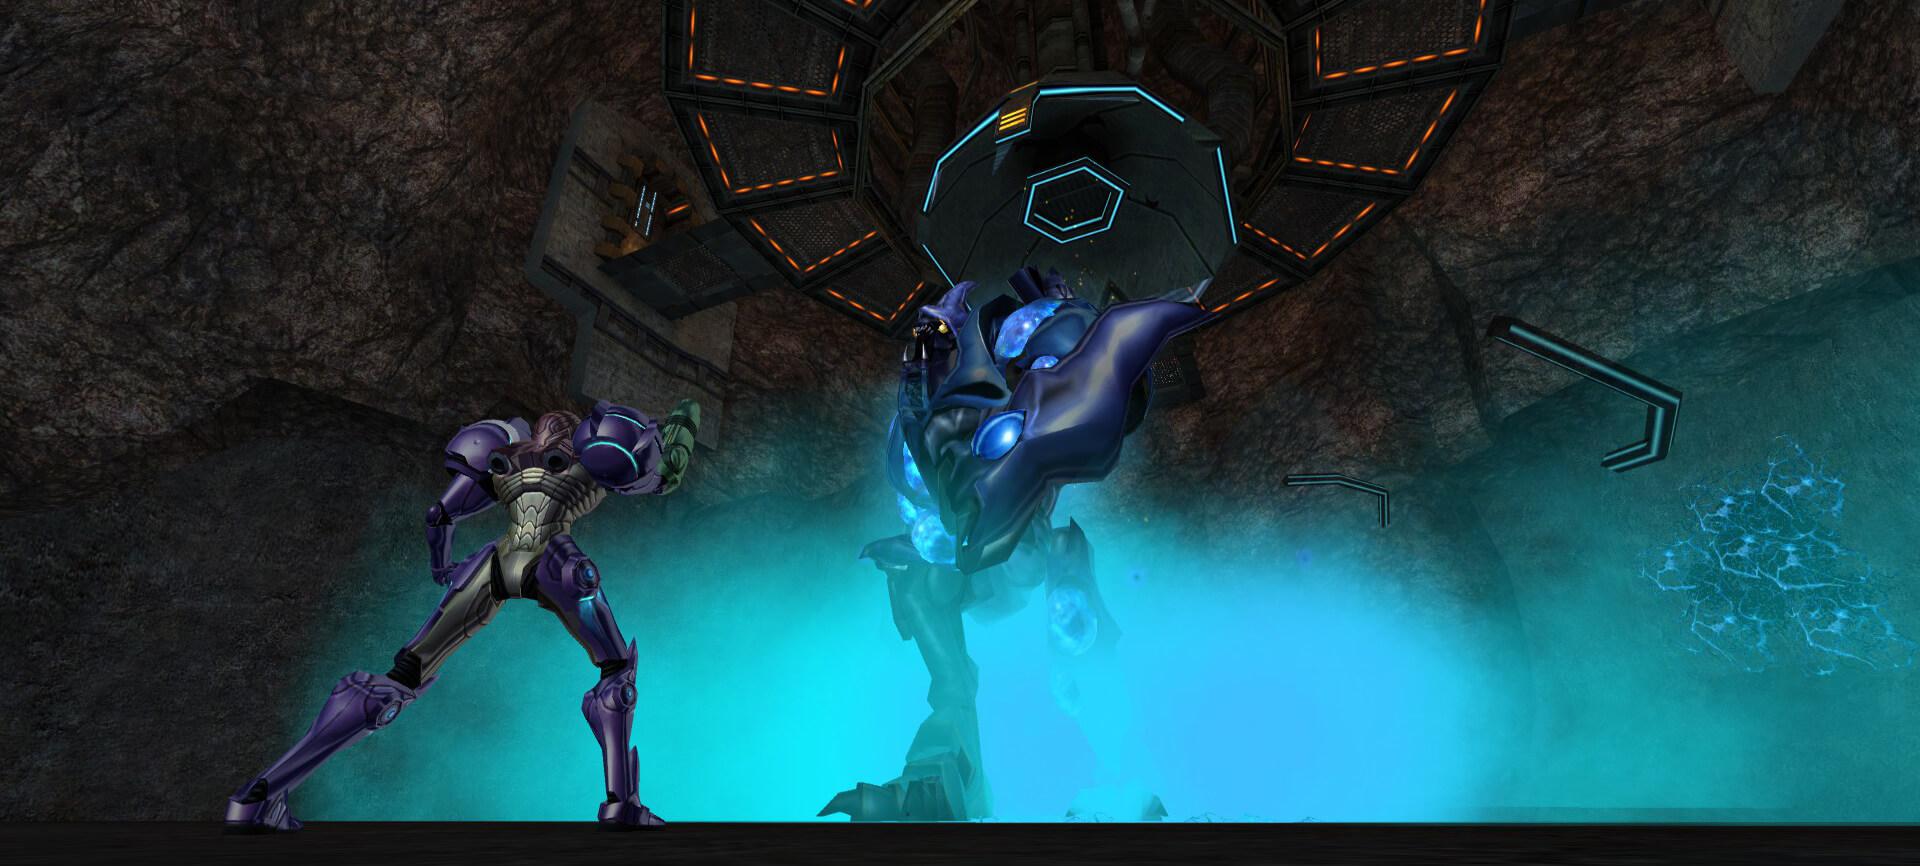 Omega Pirate Metroid Prime Metroid Story